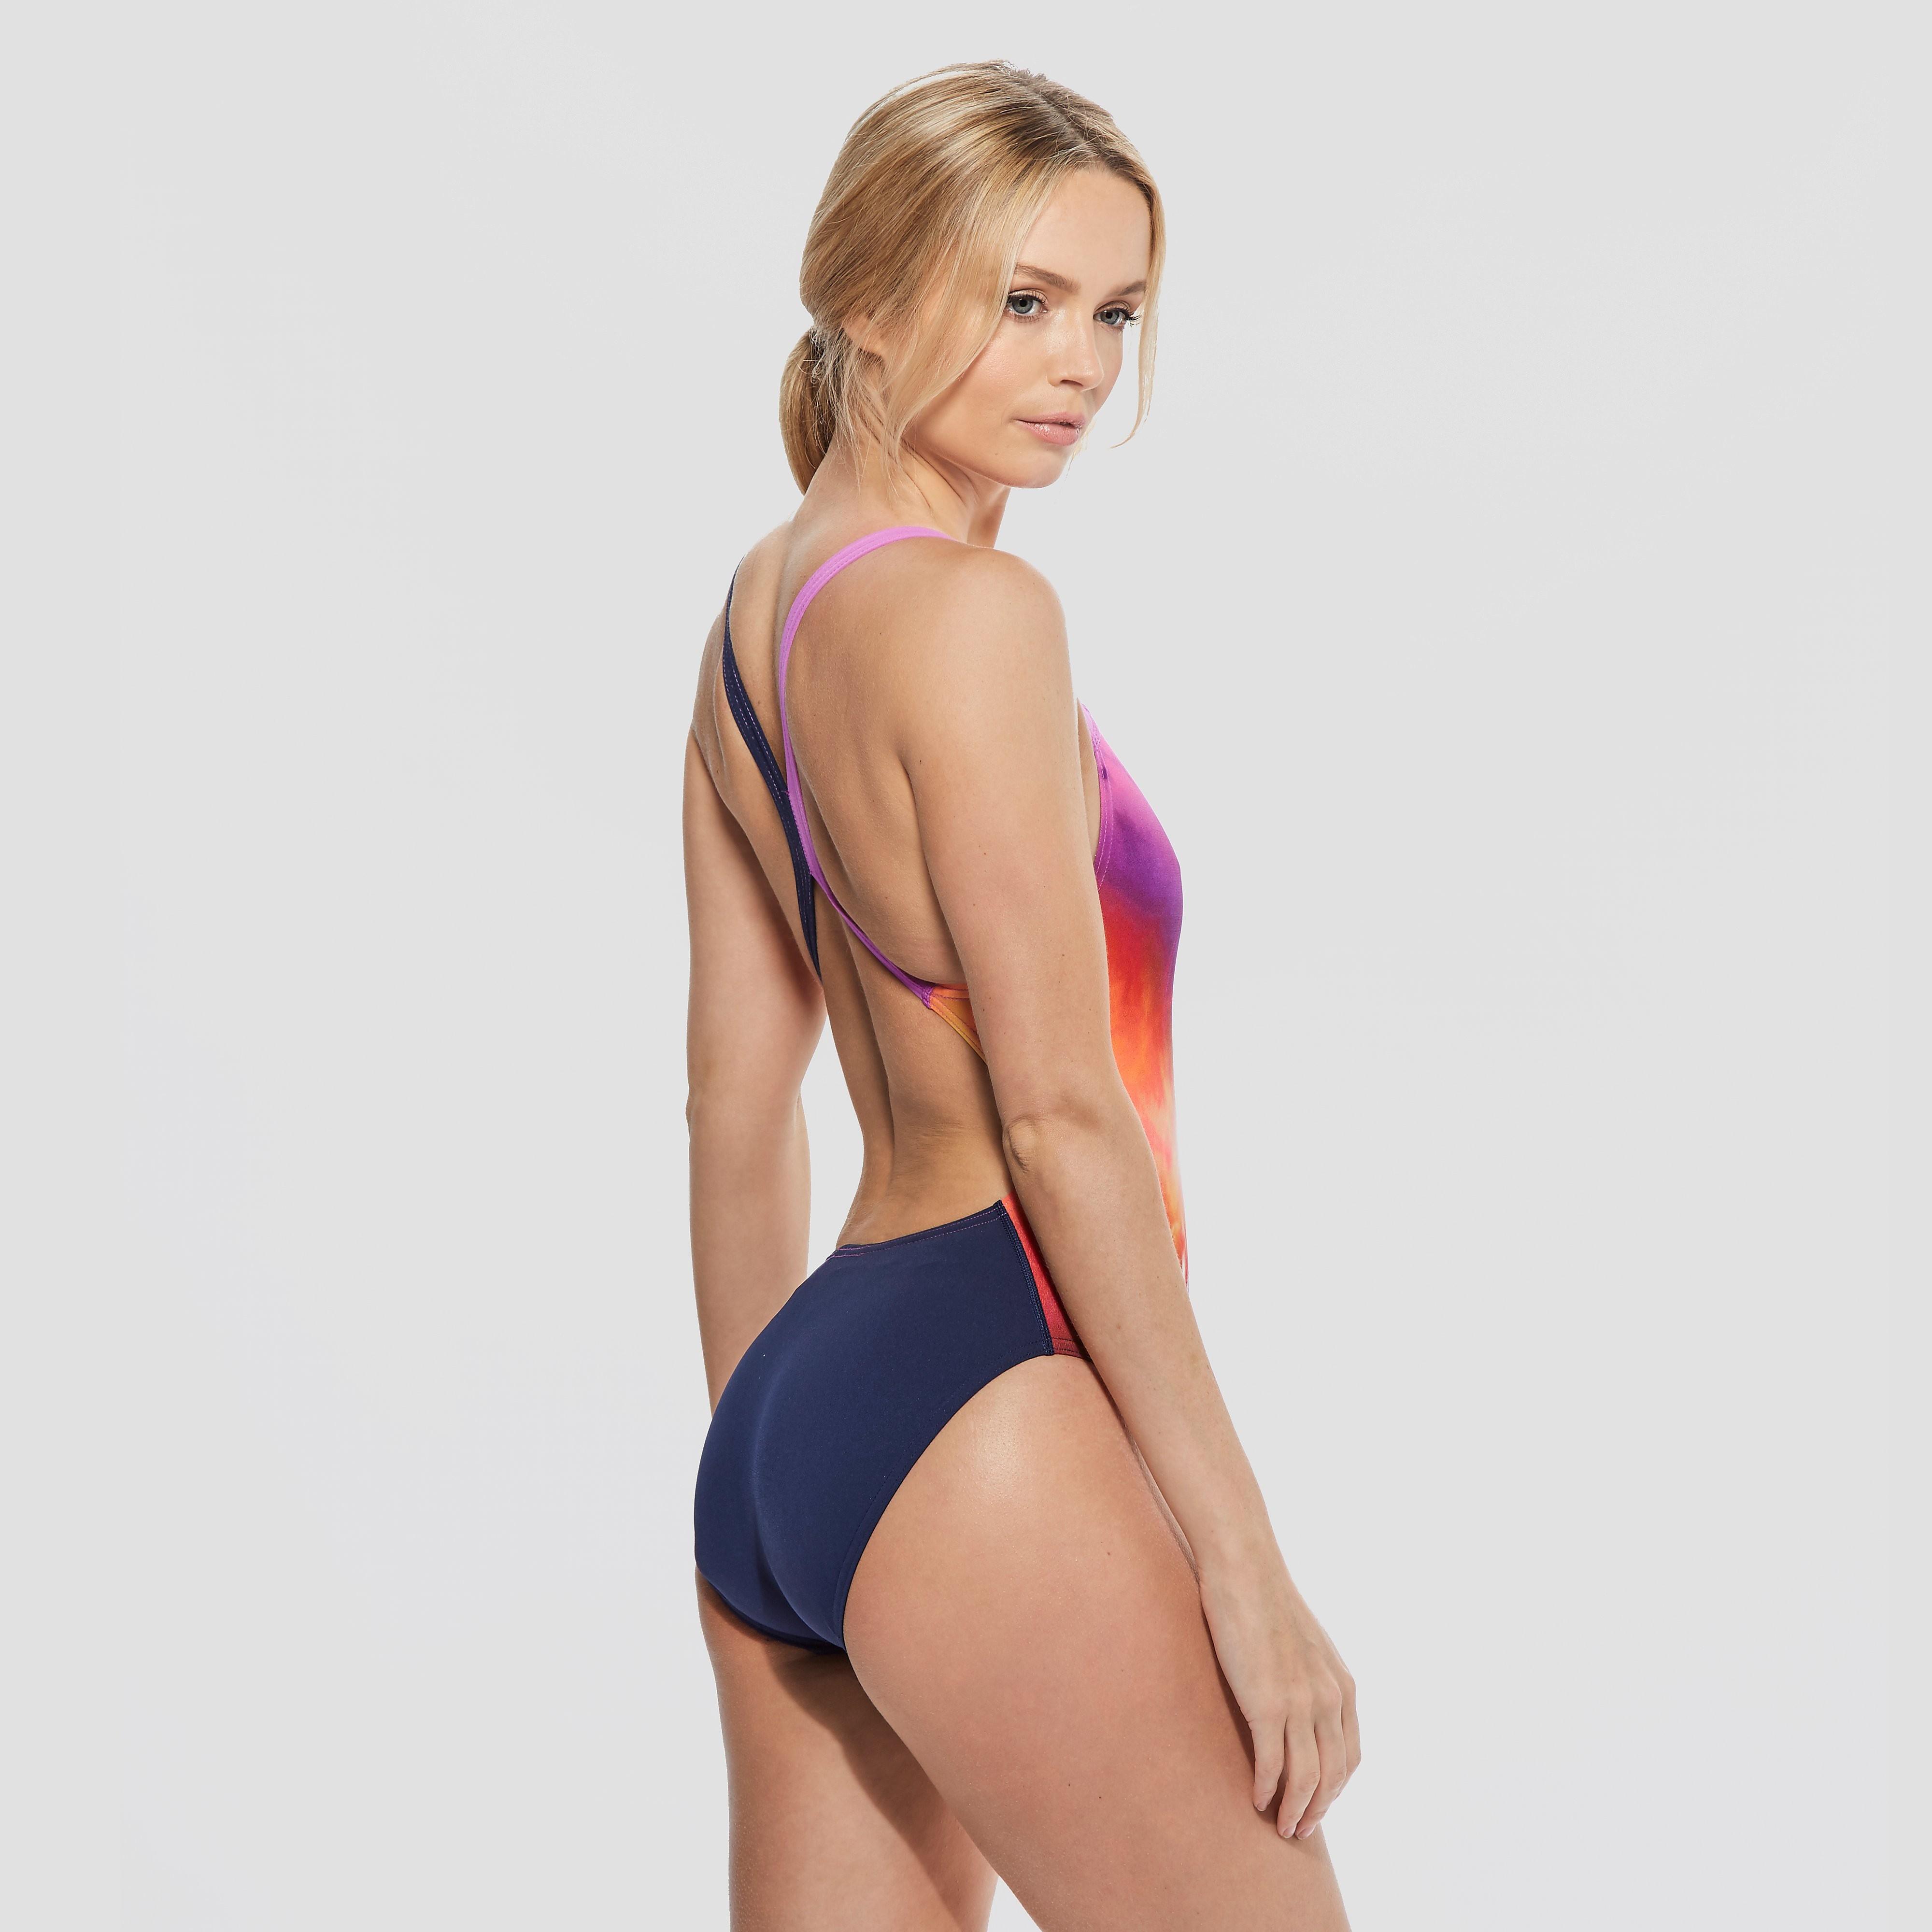 Speedo Solarvision Powerback Women's Swimsuit